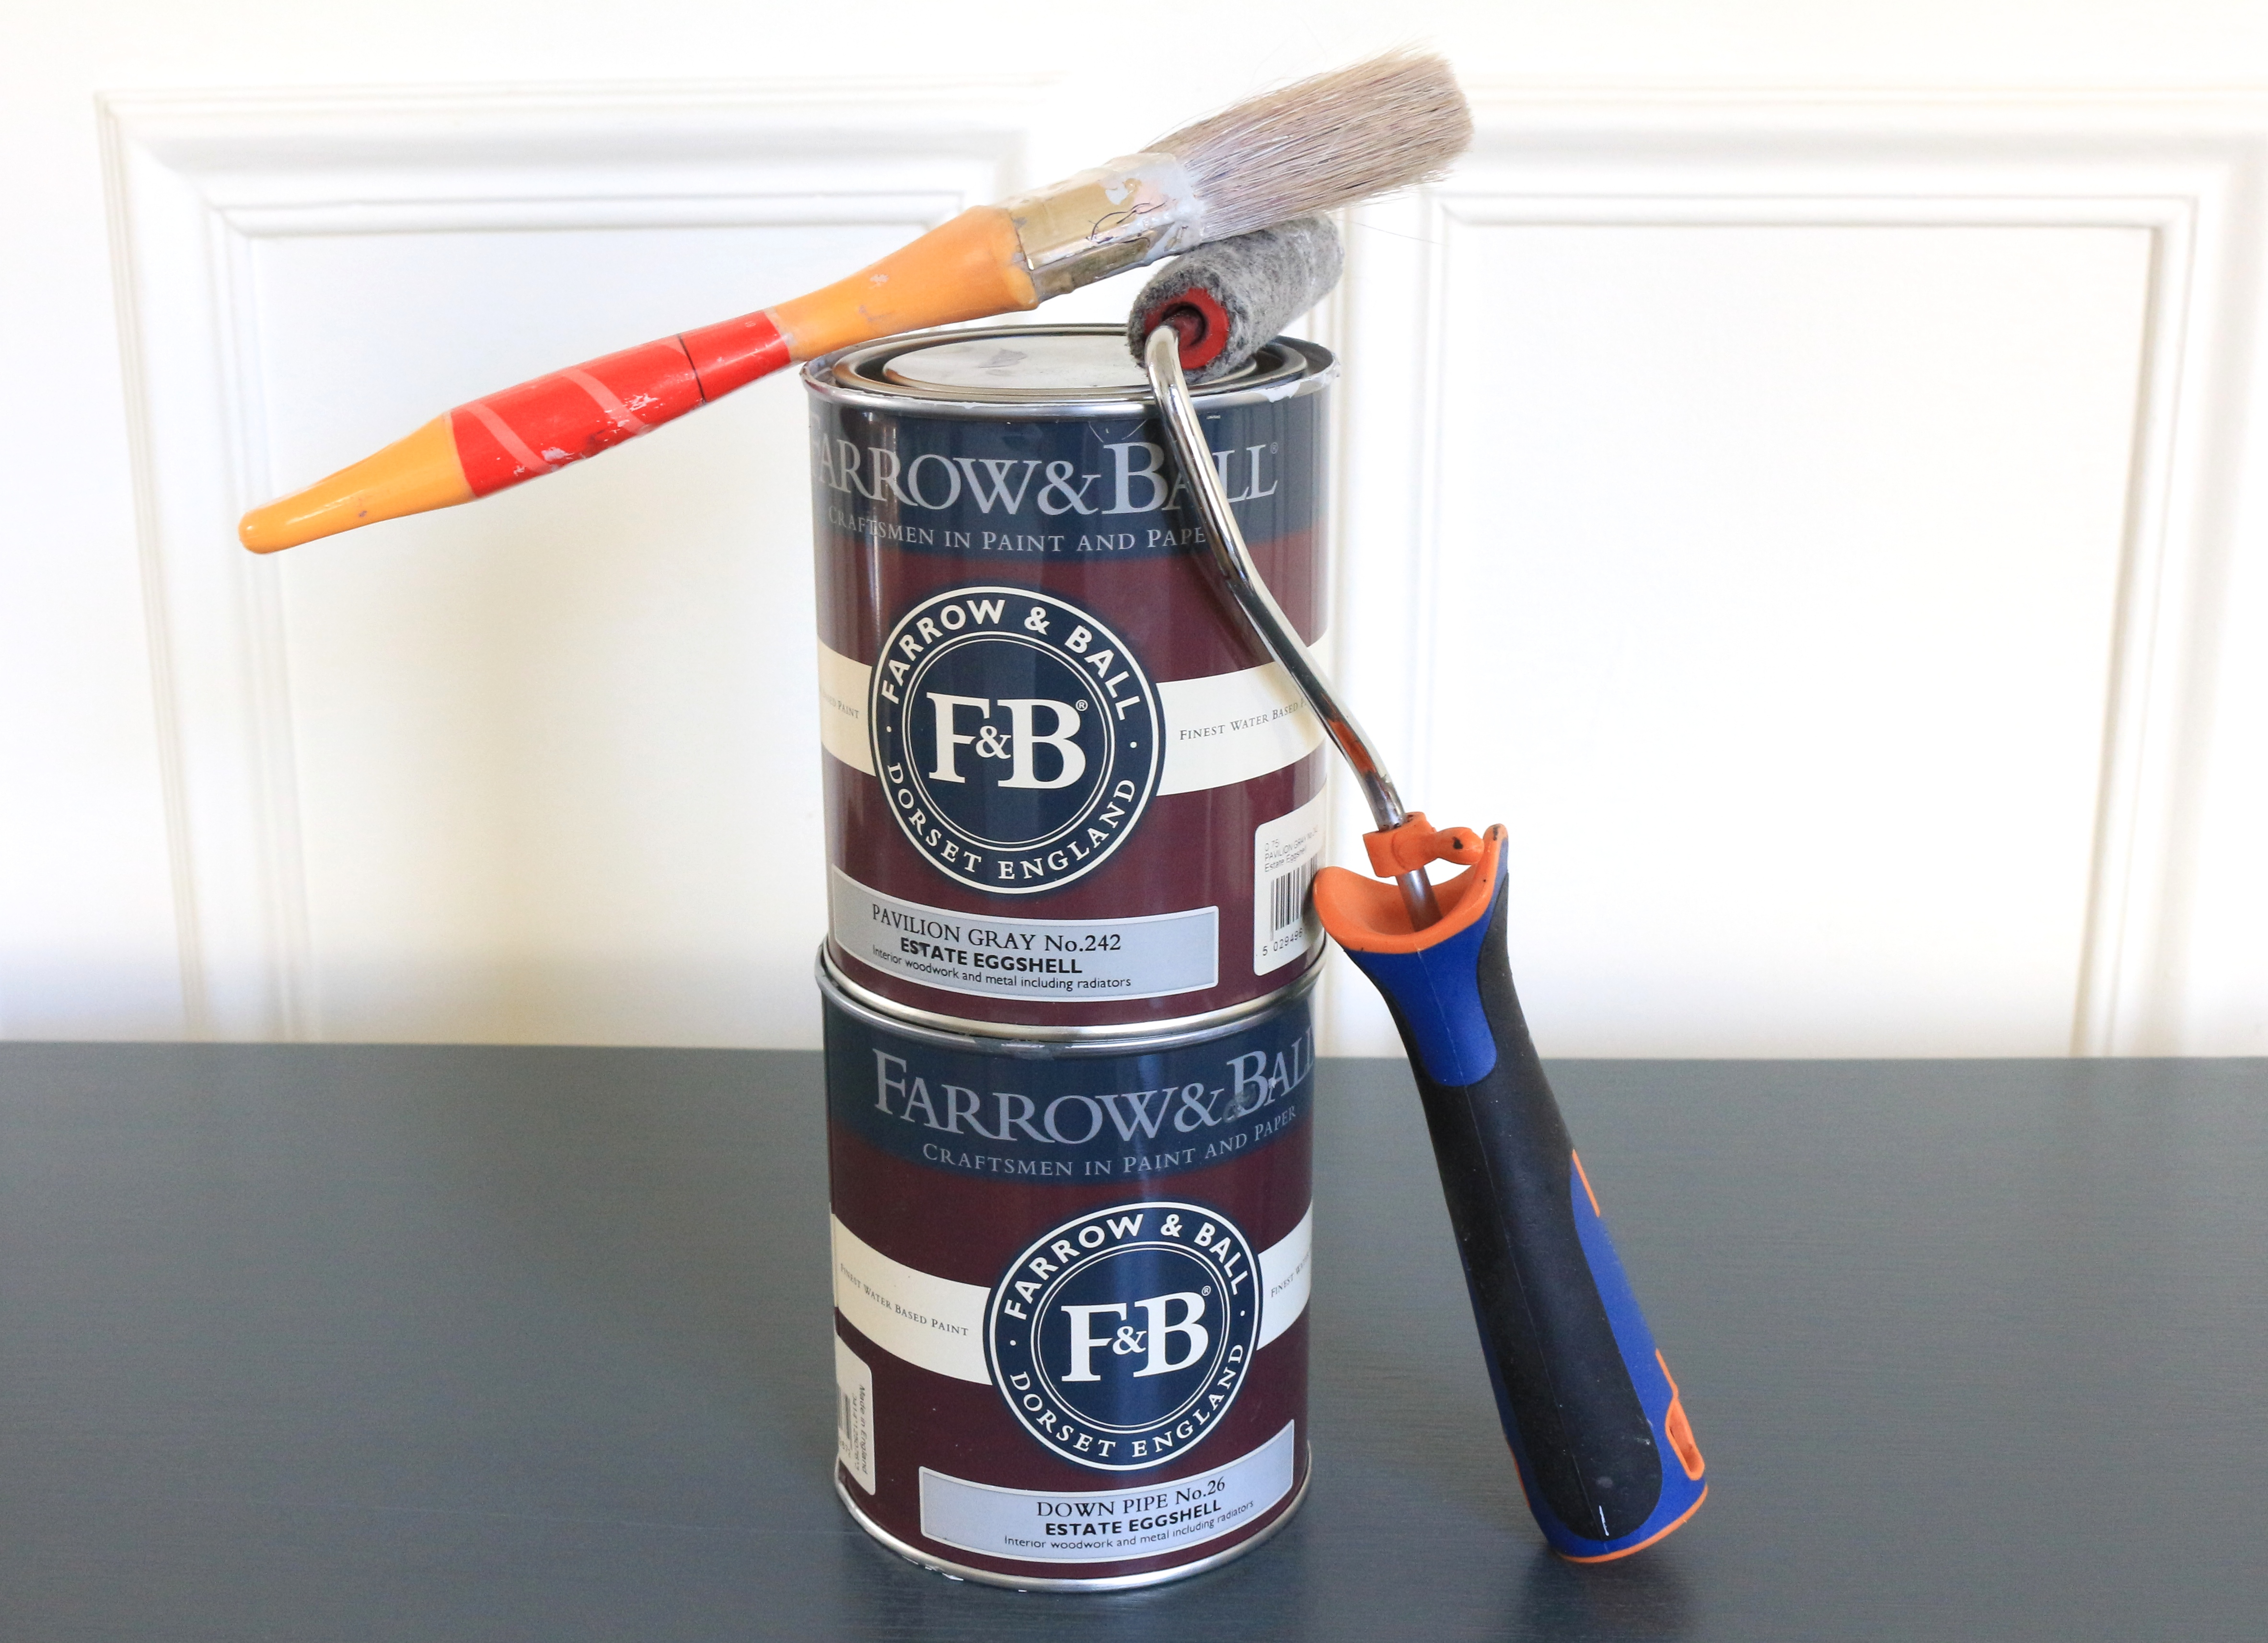 DIY painting / painted furniture